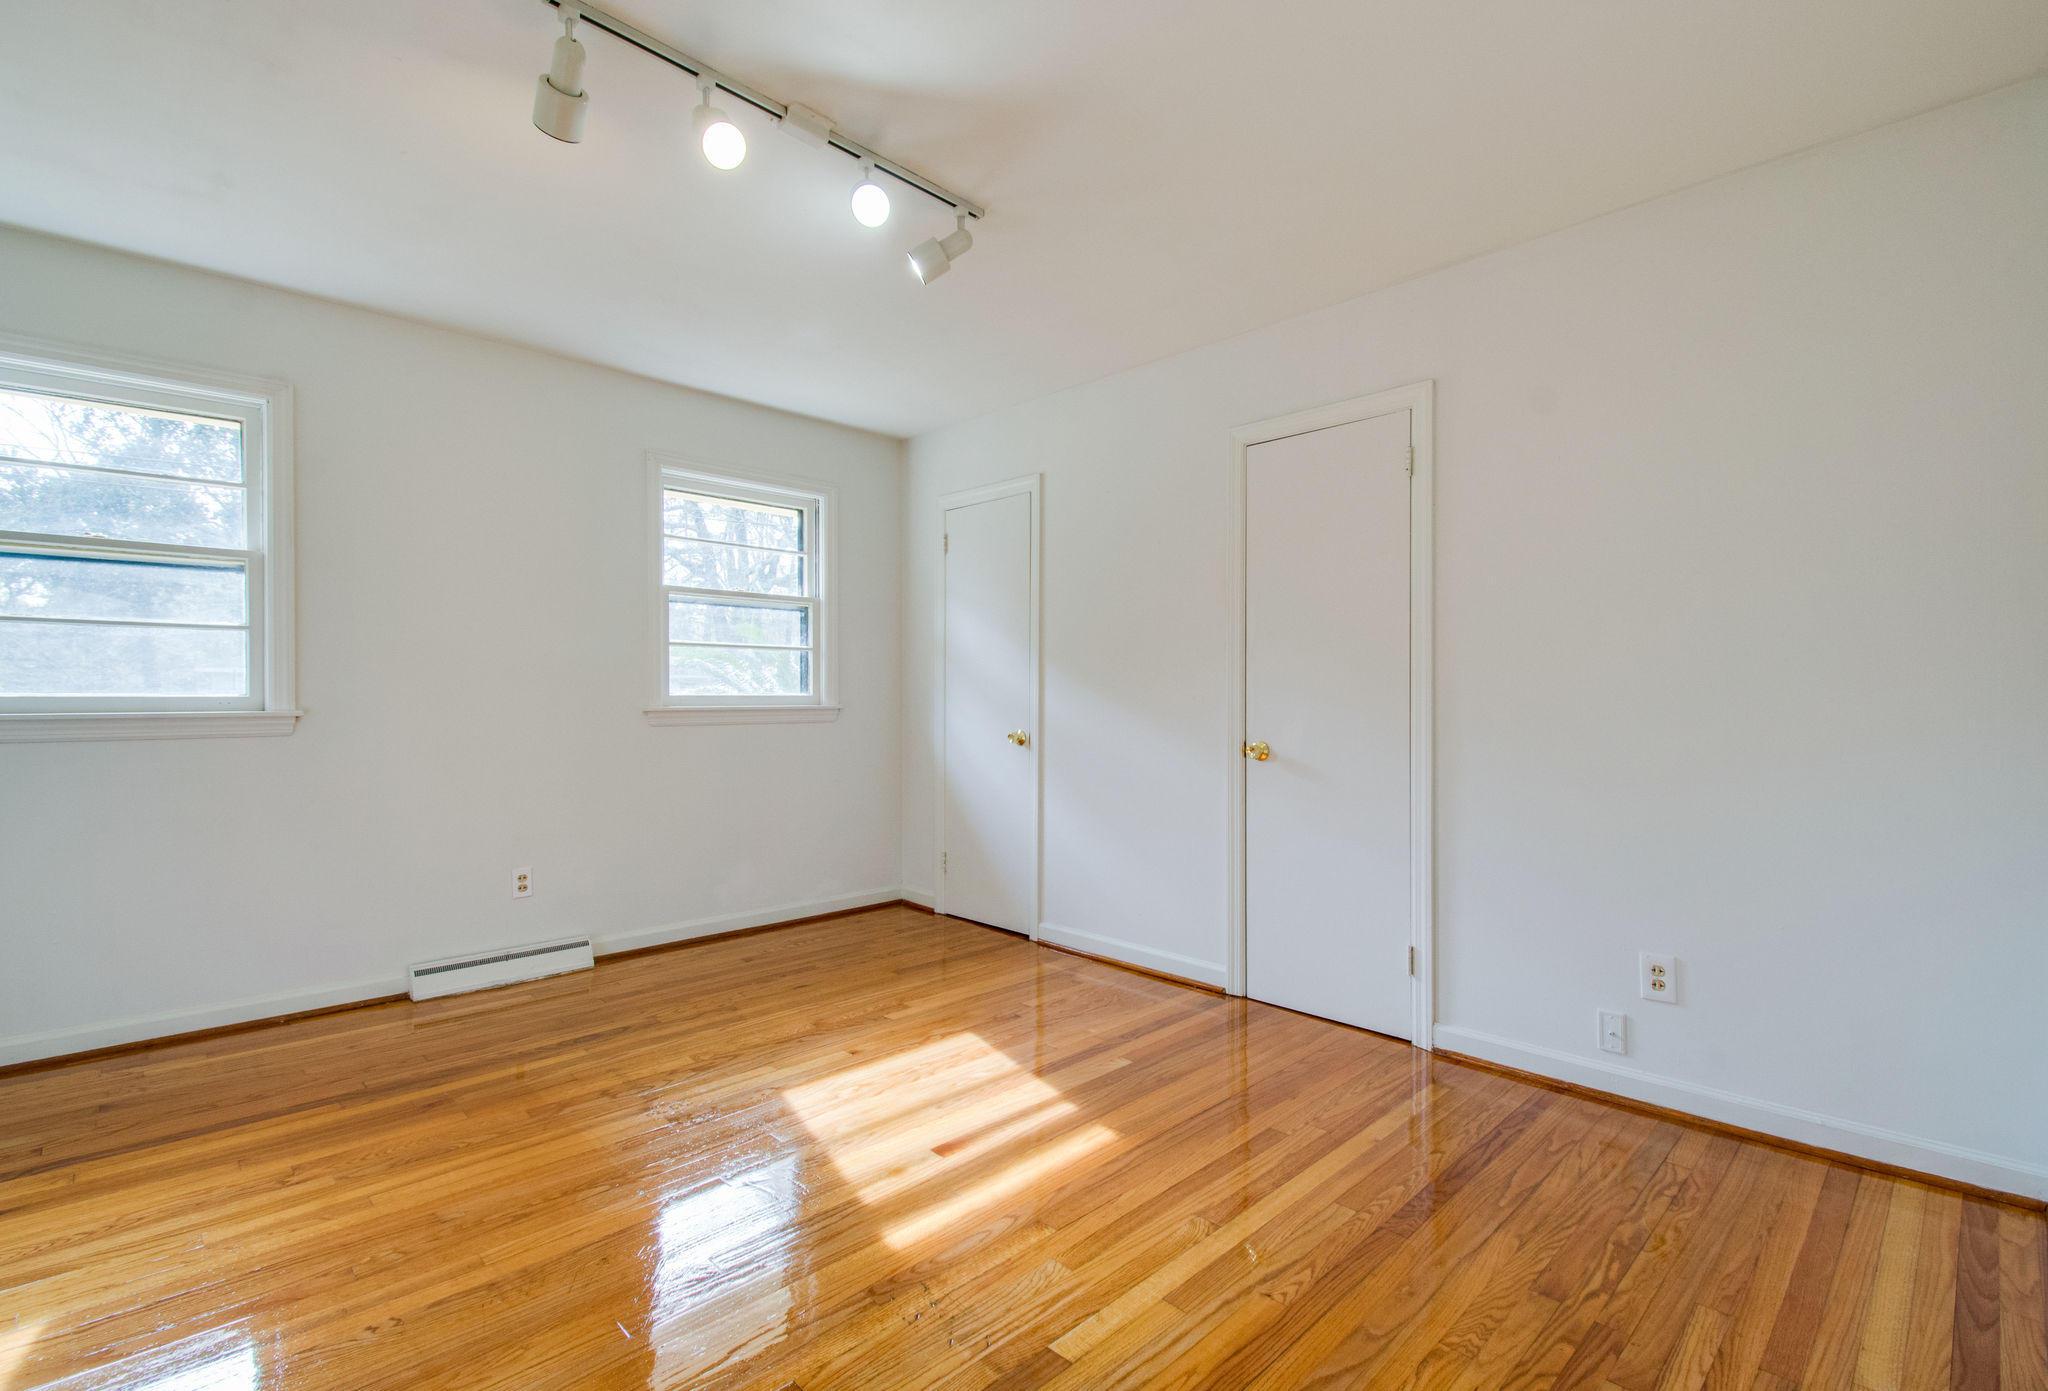 Northbridge Terrace Homes For Sale - 1114 Northbridge, Charleston, SC - 9